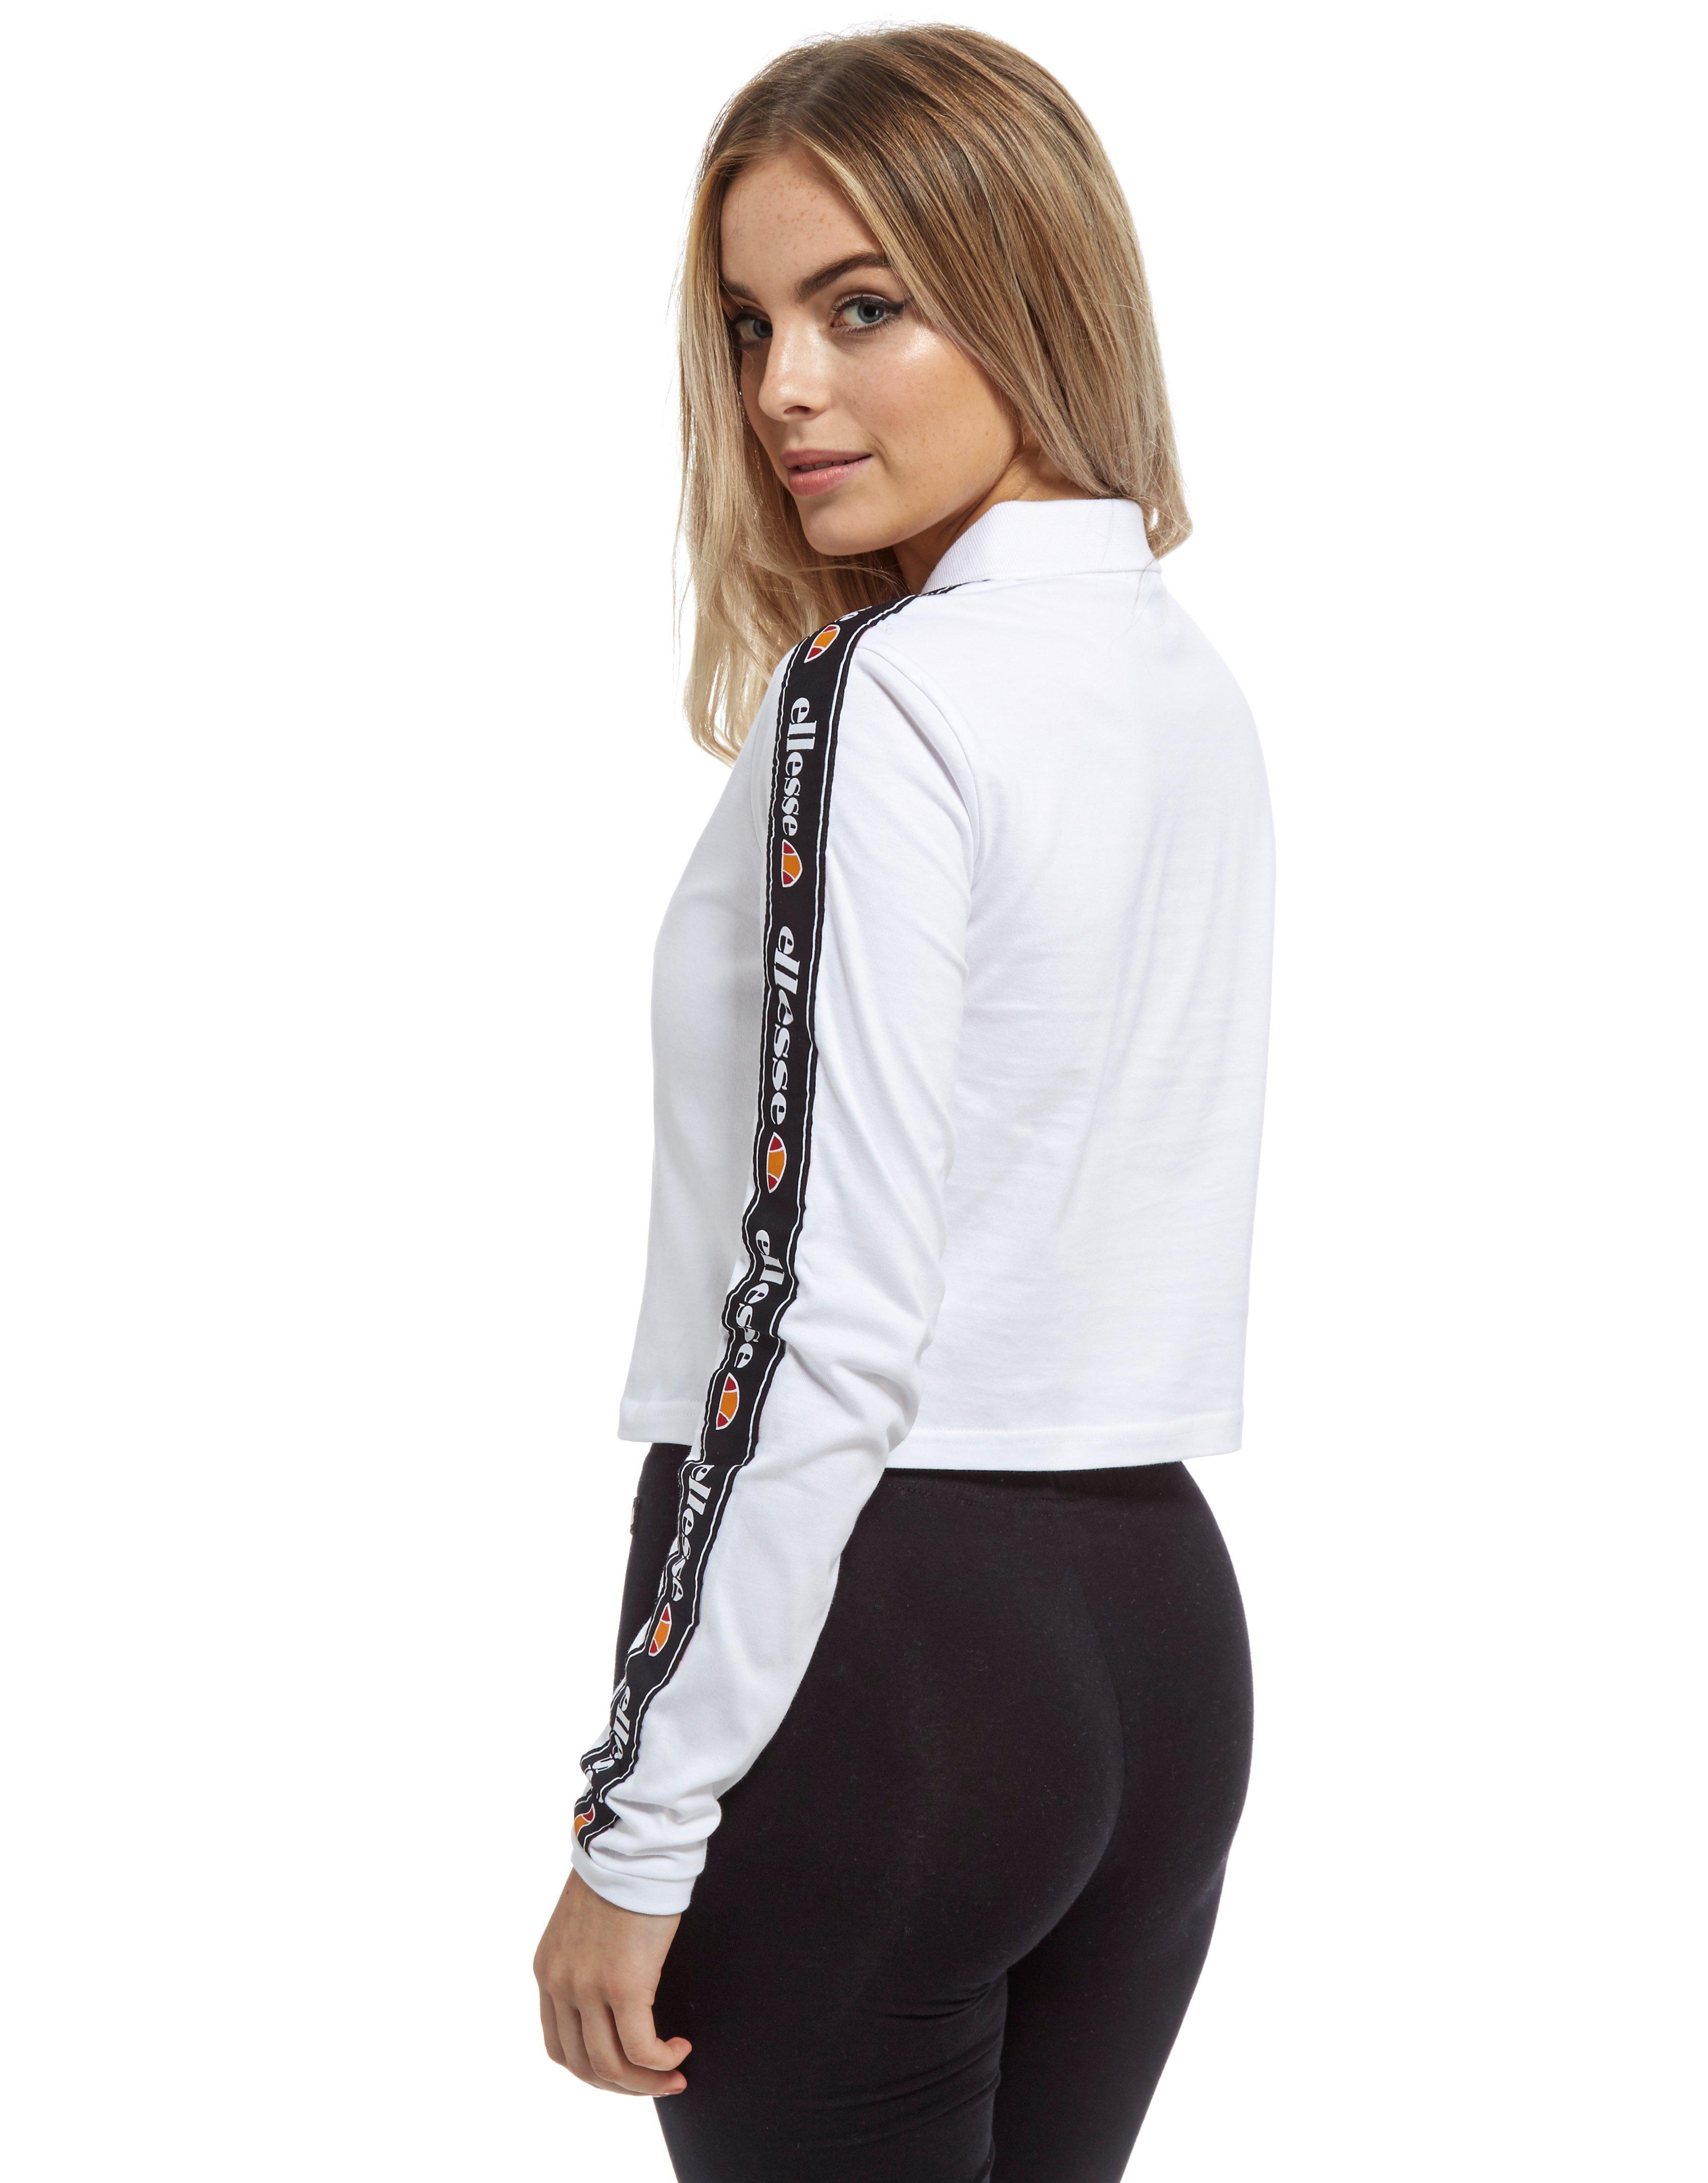 d9c308312af Ellesse Long Sleeve Crop Polo Top in White - Lyst